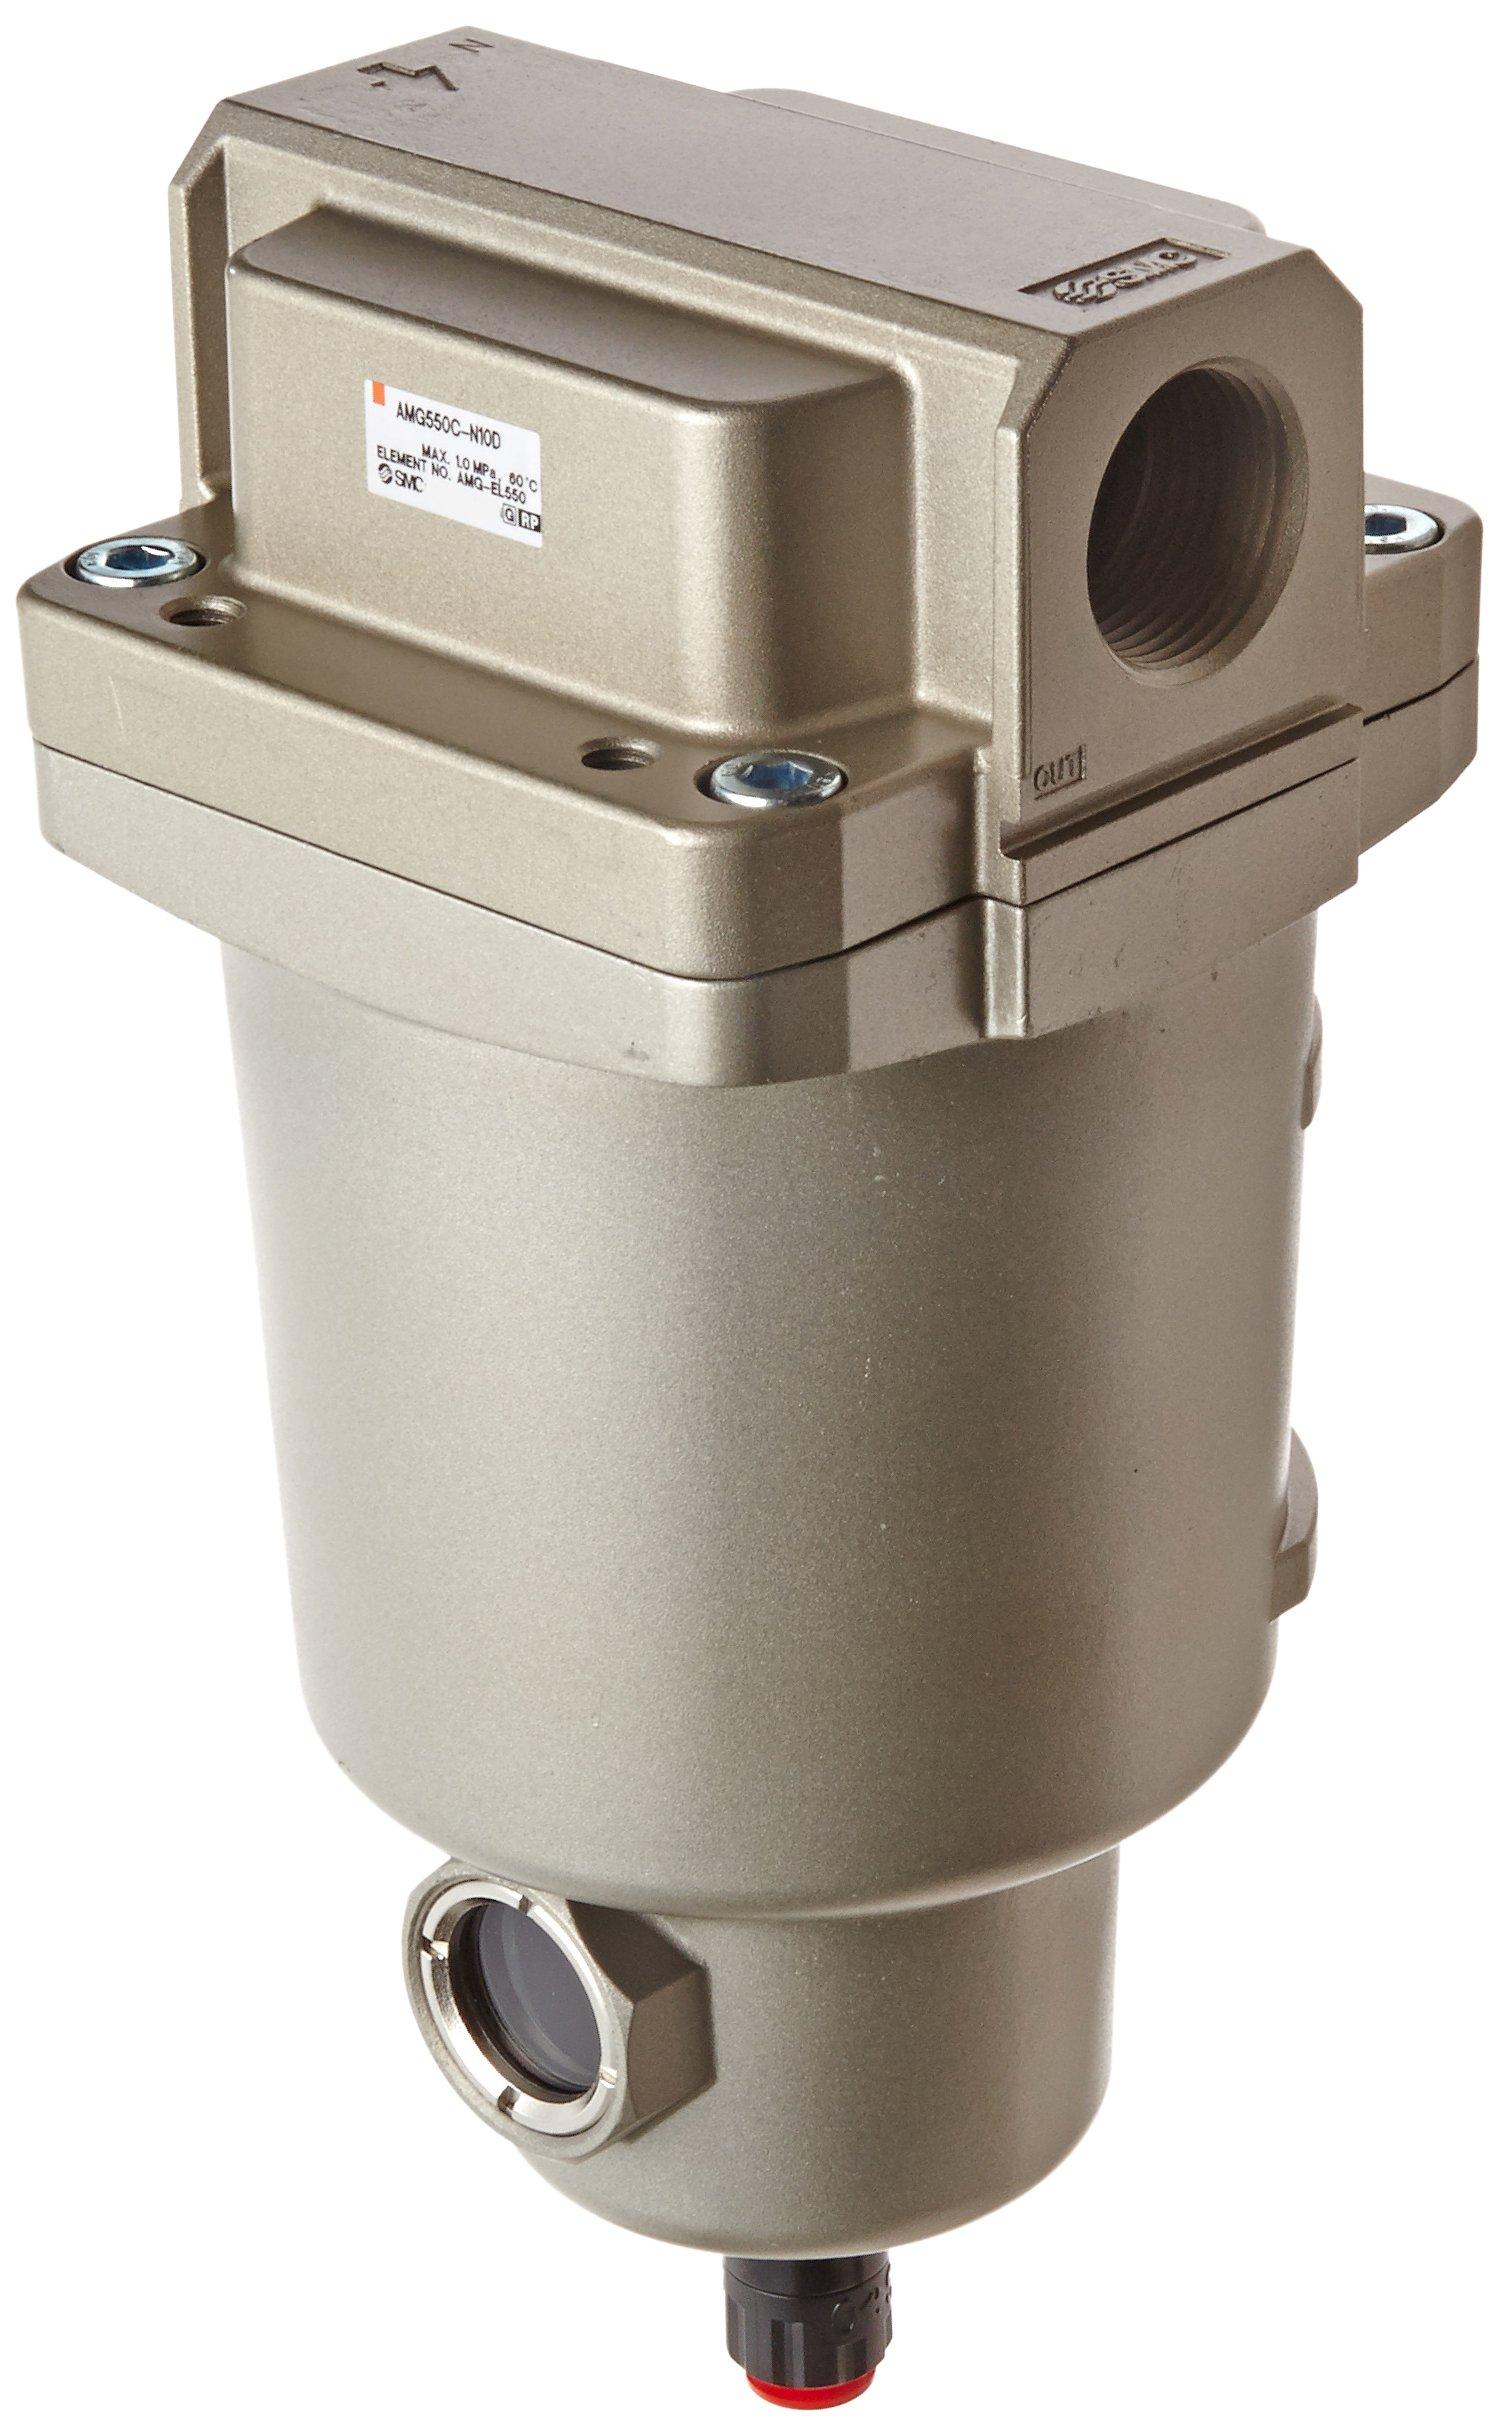 SMC AMG550C-N10D Water Separator, N.O. Auto Drain, 3,700 L/min, 1'' NPT